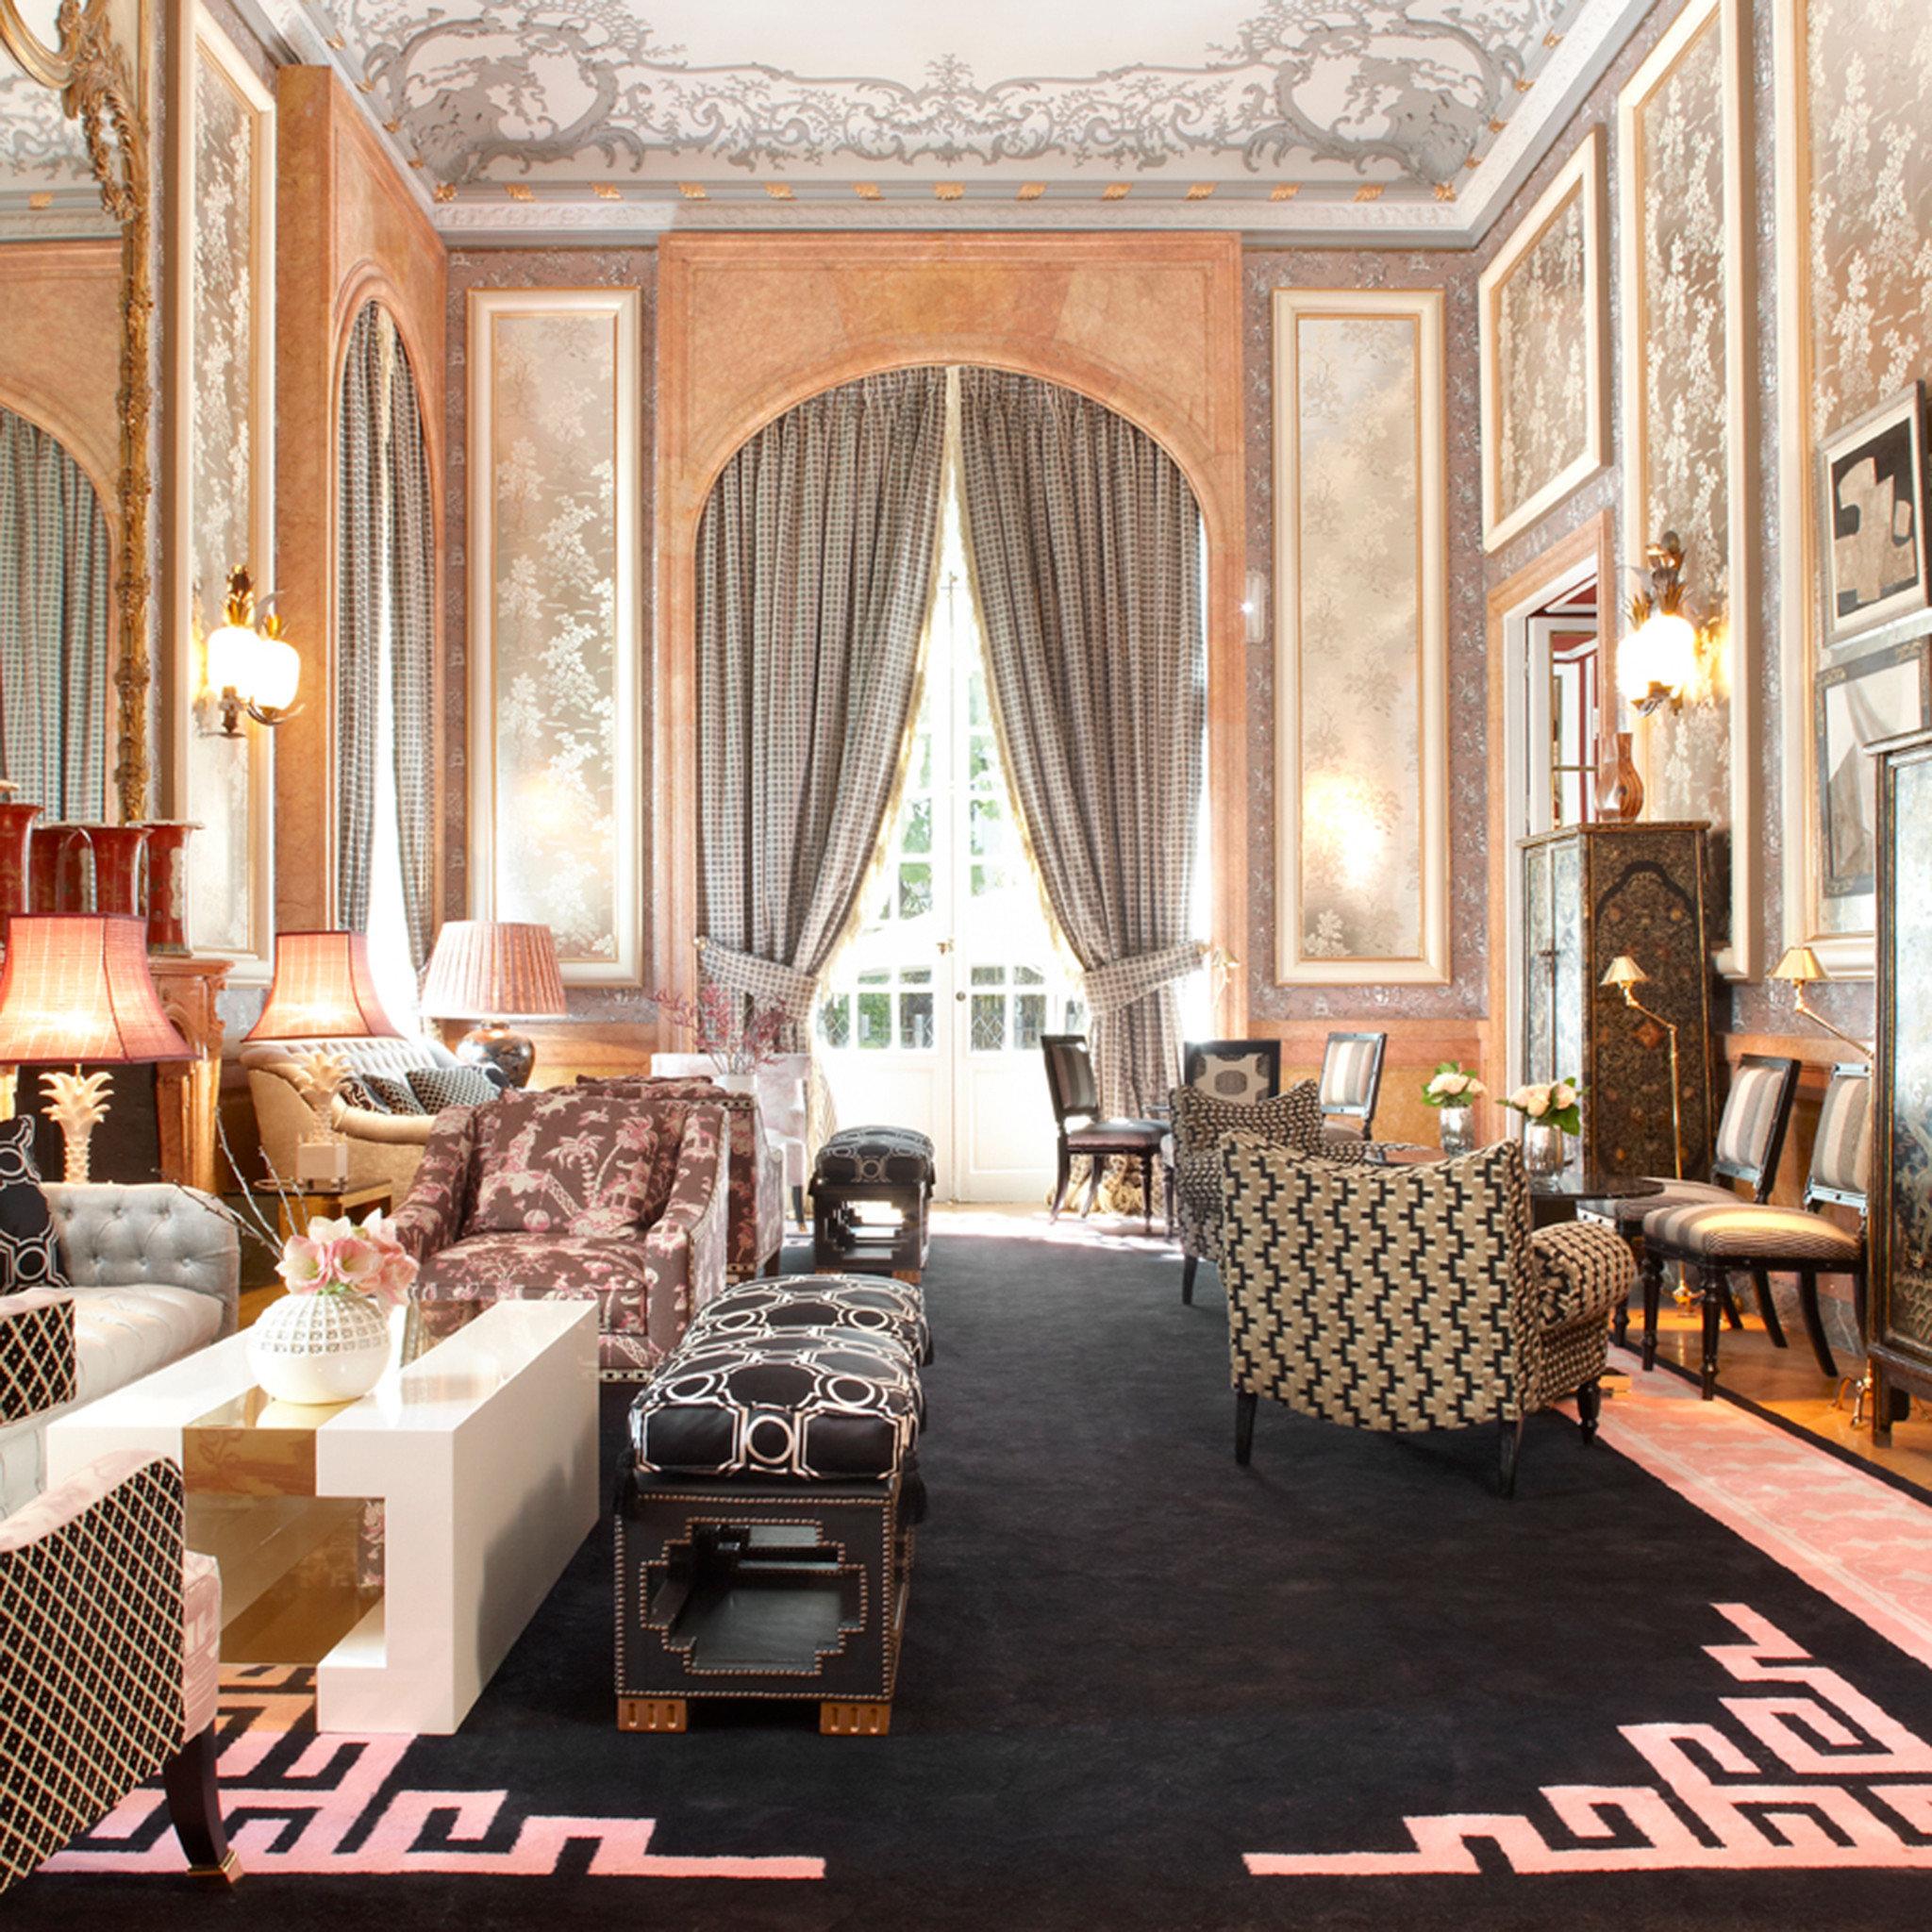 Hip Lounge Luxury Modern property Lobby palace restaurant living room mansion ballroom